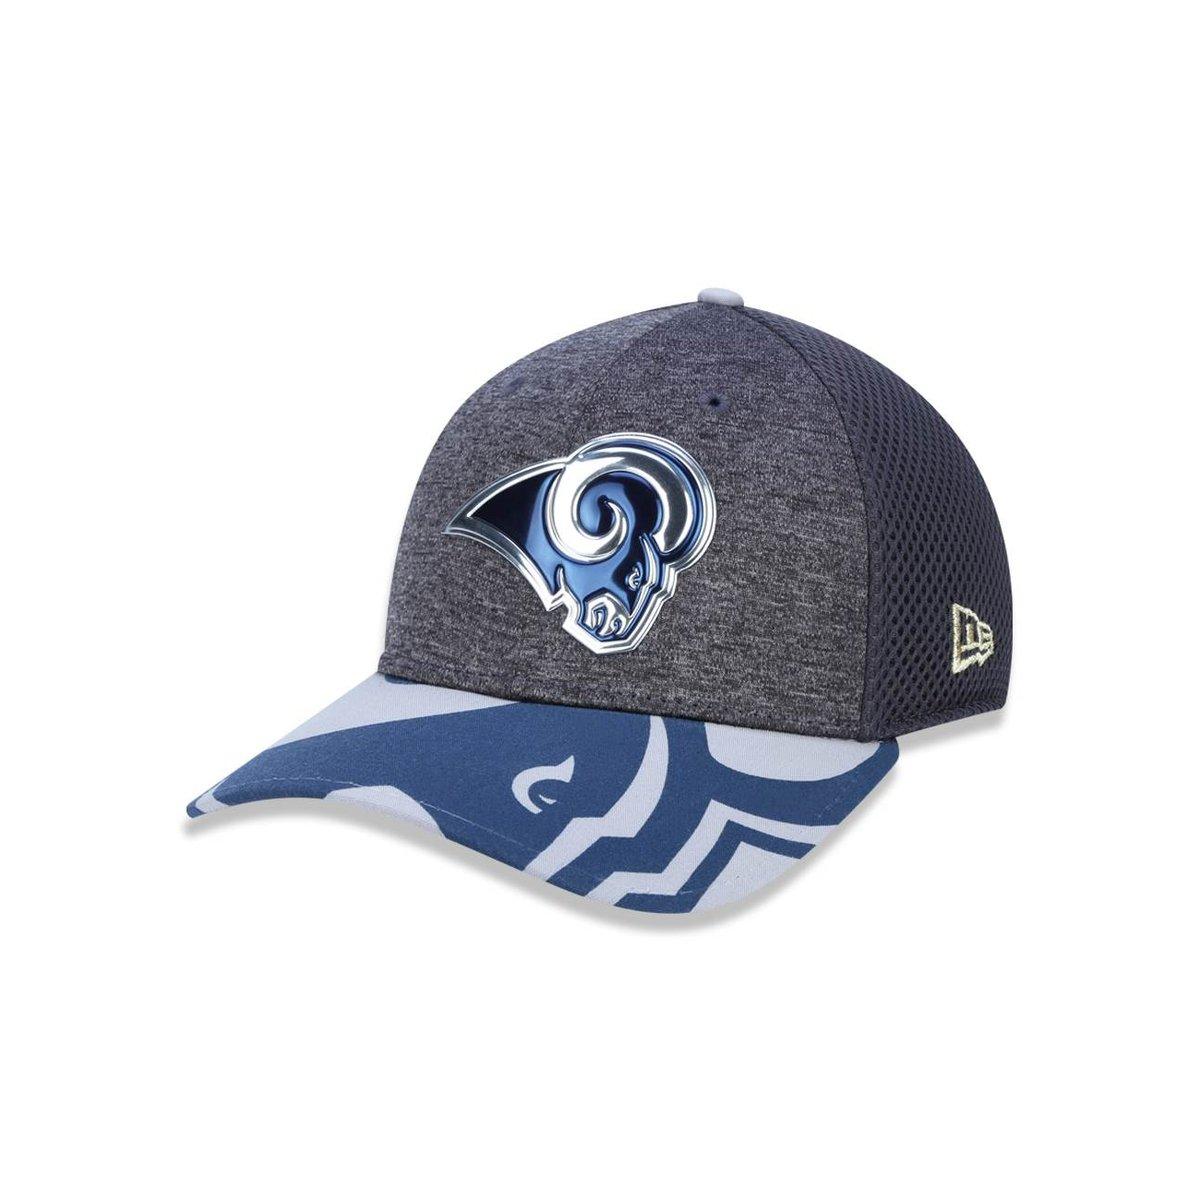 Boné 3930 Los Angeles Rams NFL Aba Curva New Era - Cinza - Compre Agora  73ca06413a6